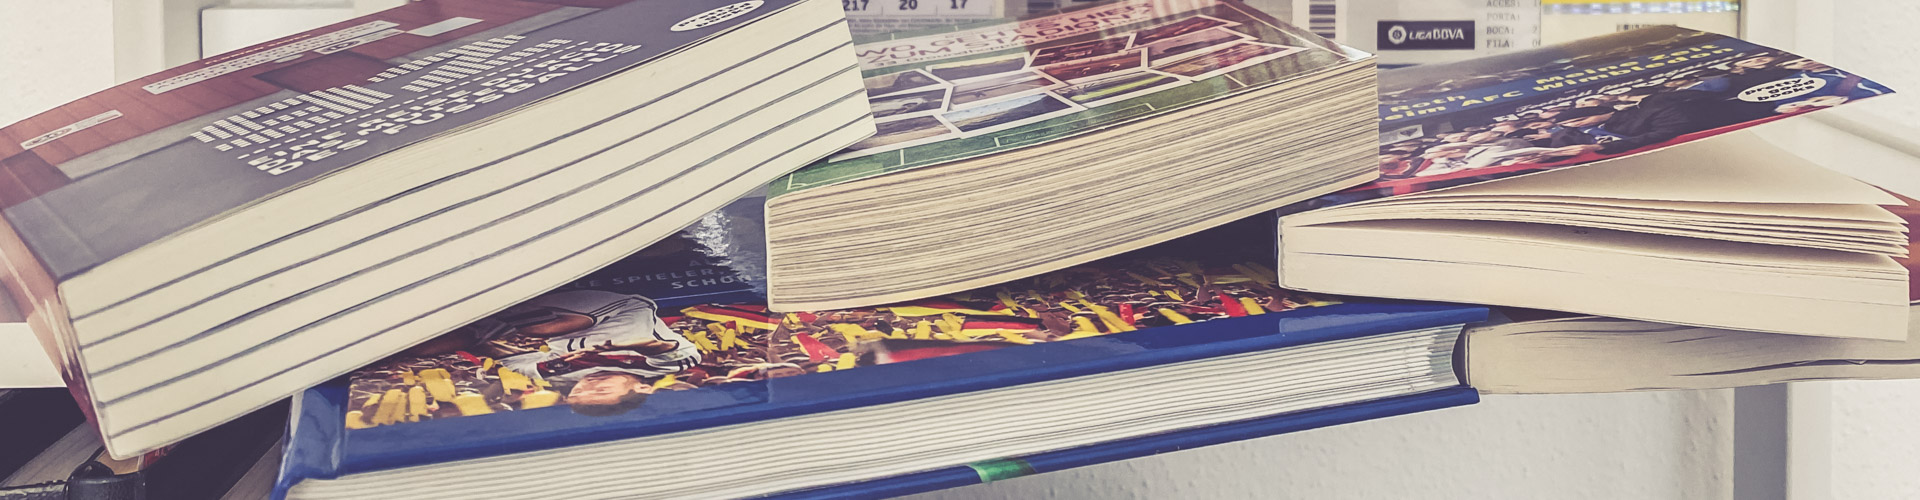 Groundhopping Bücher Header